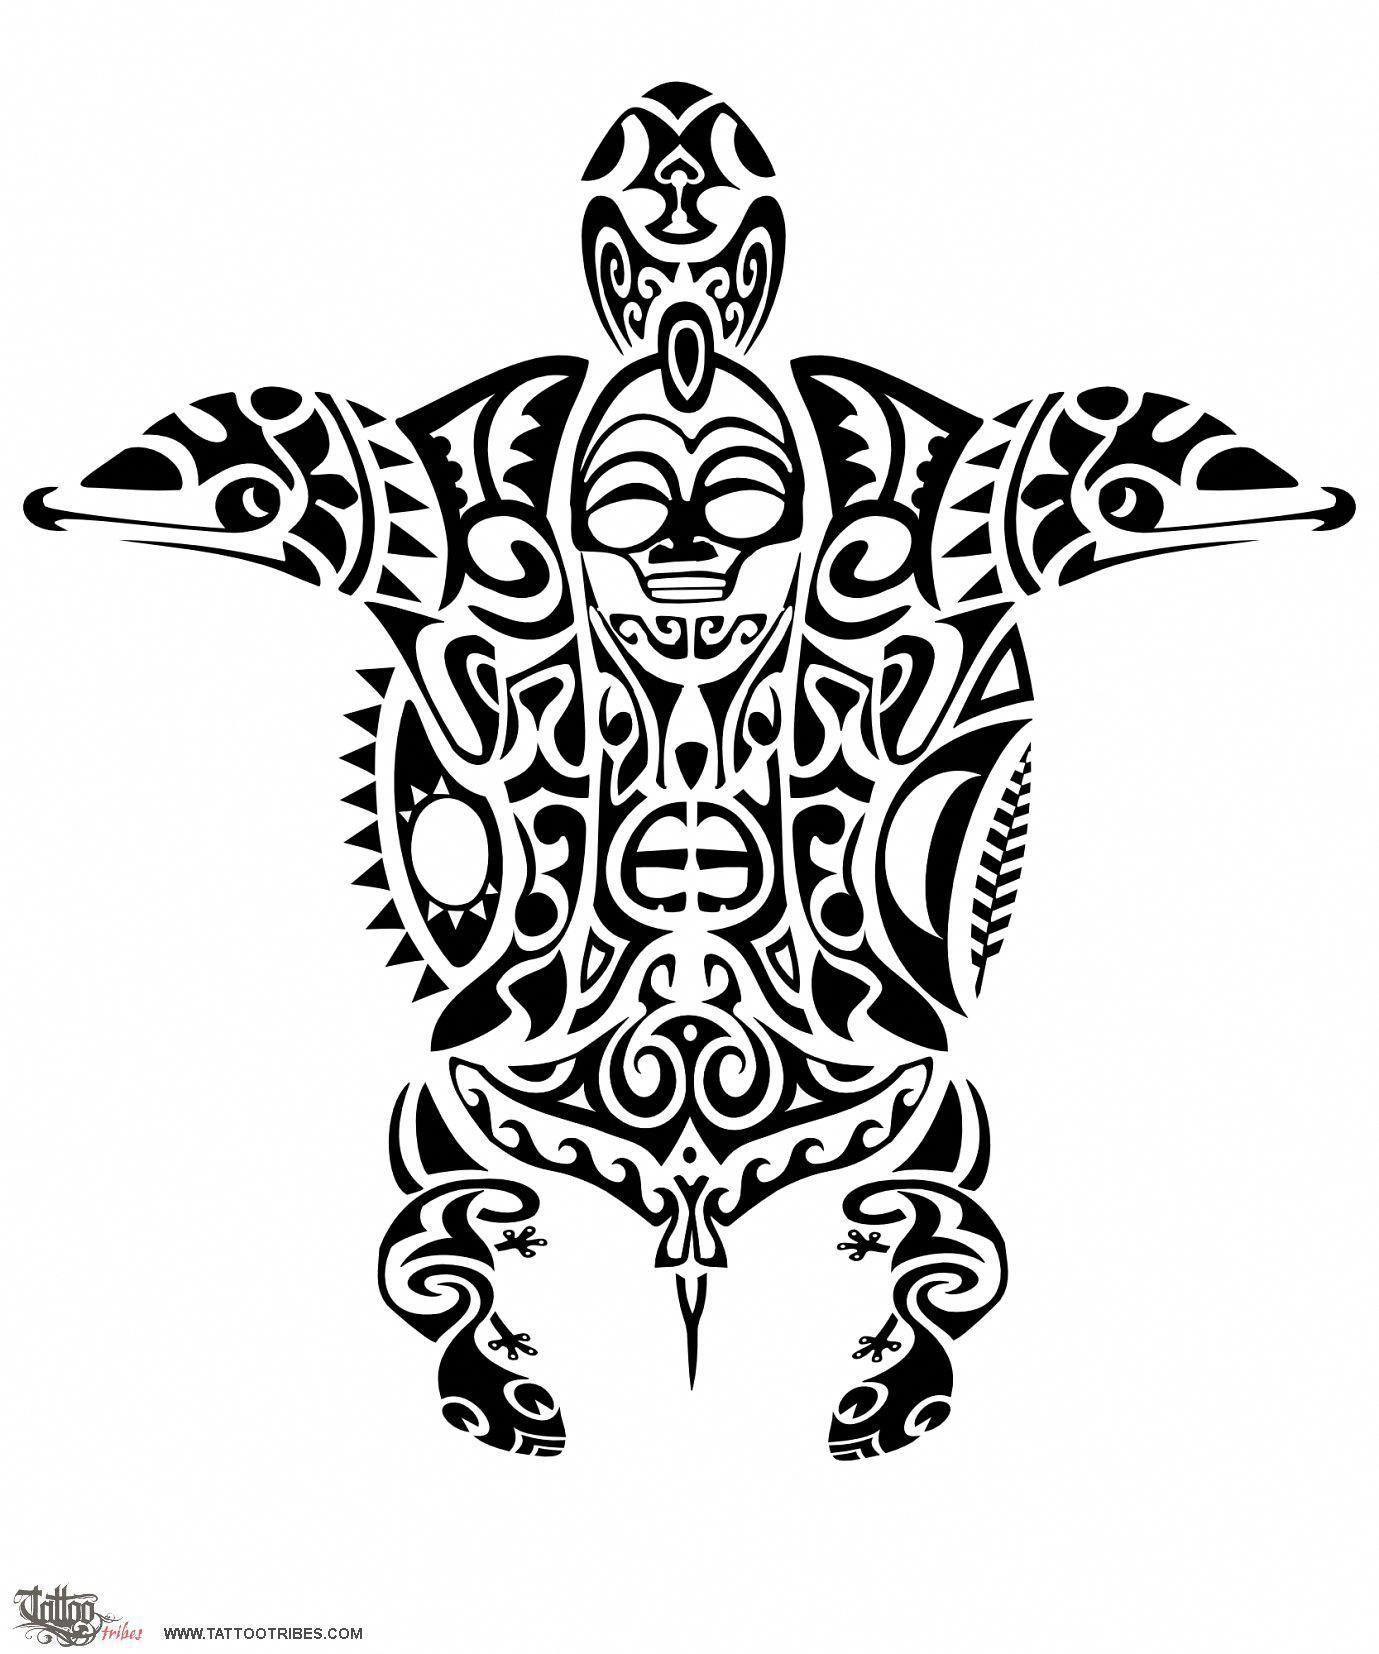 0dcd57695 maori tattoos jesus #Maoritattoos | Maori tattoos | Tetoválás ...